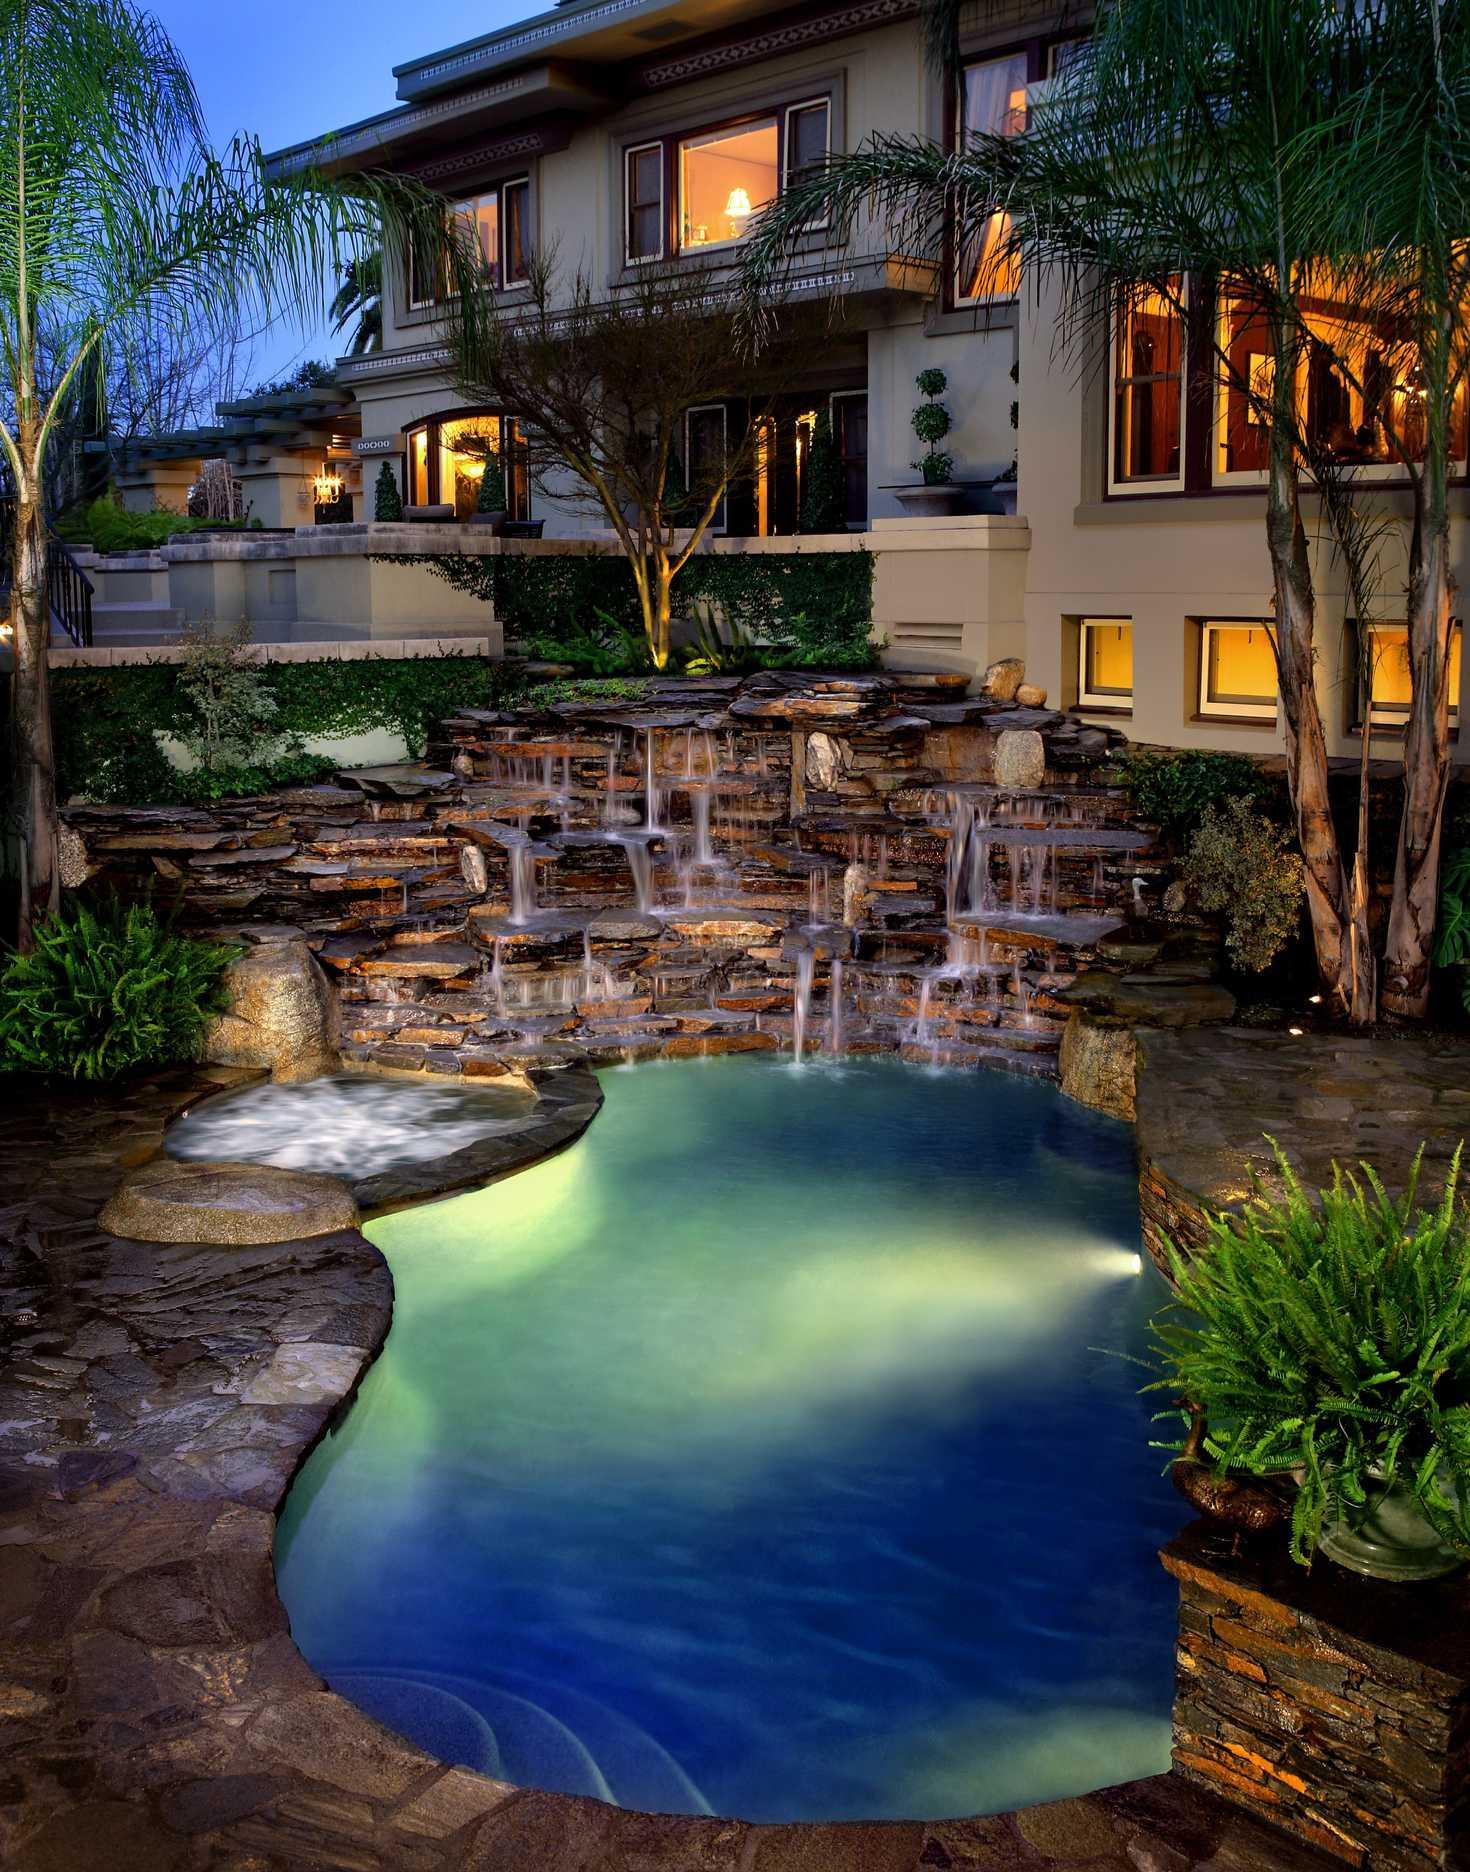 Luxe h2o hancock park pool design construction in los for Pool design los angeles ca